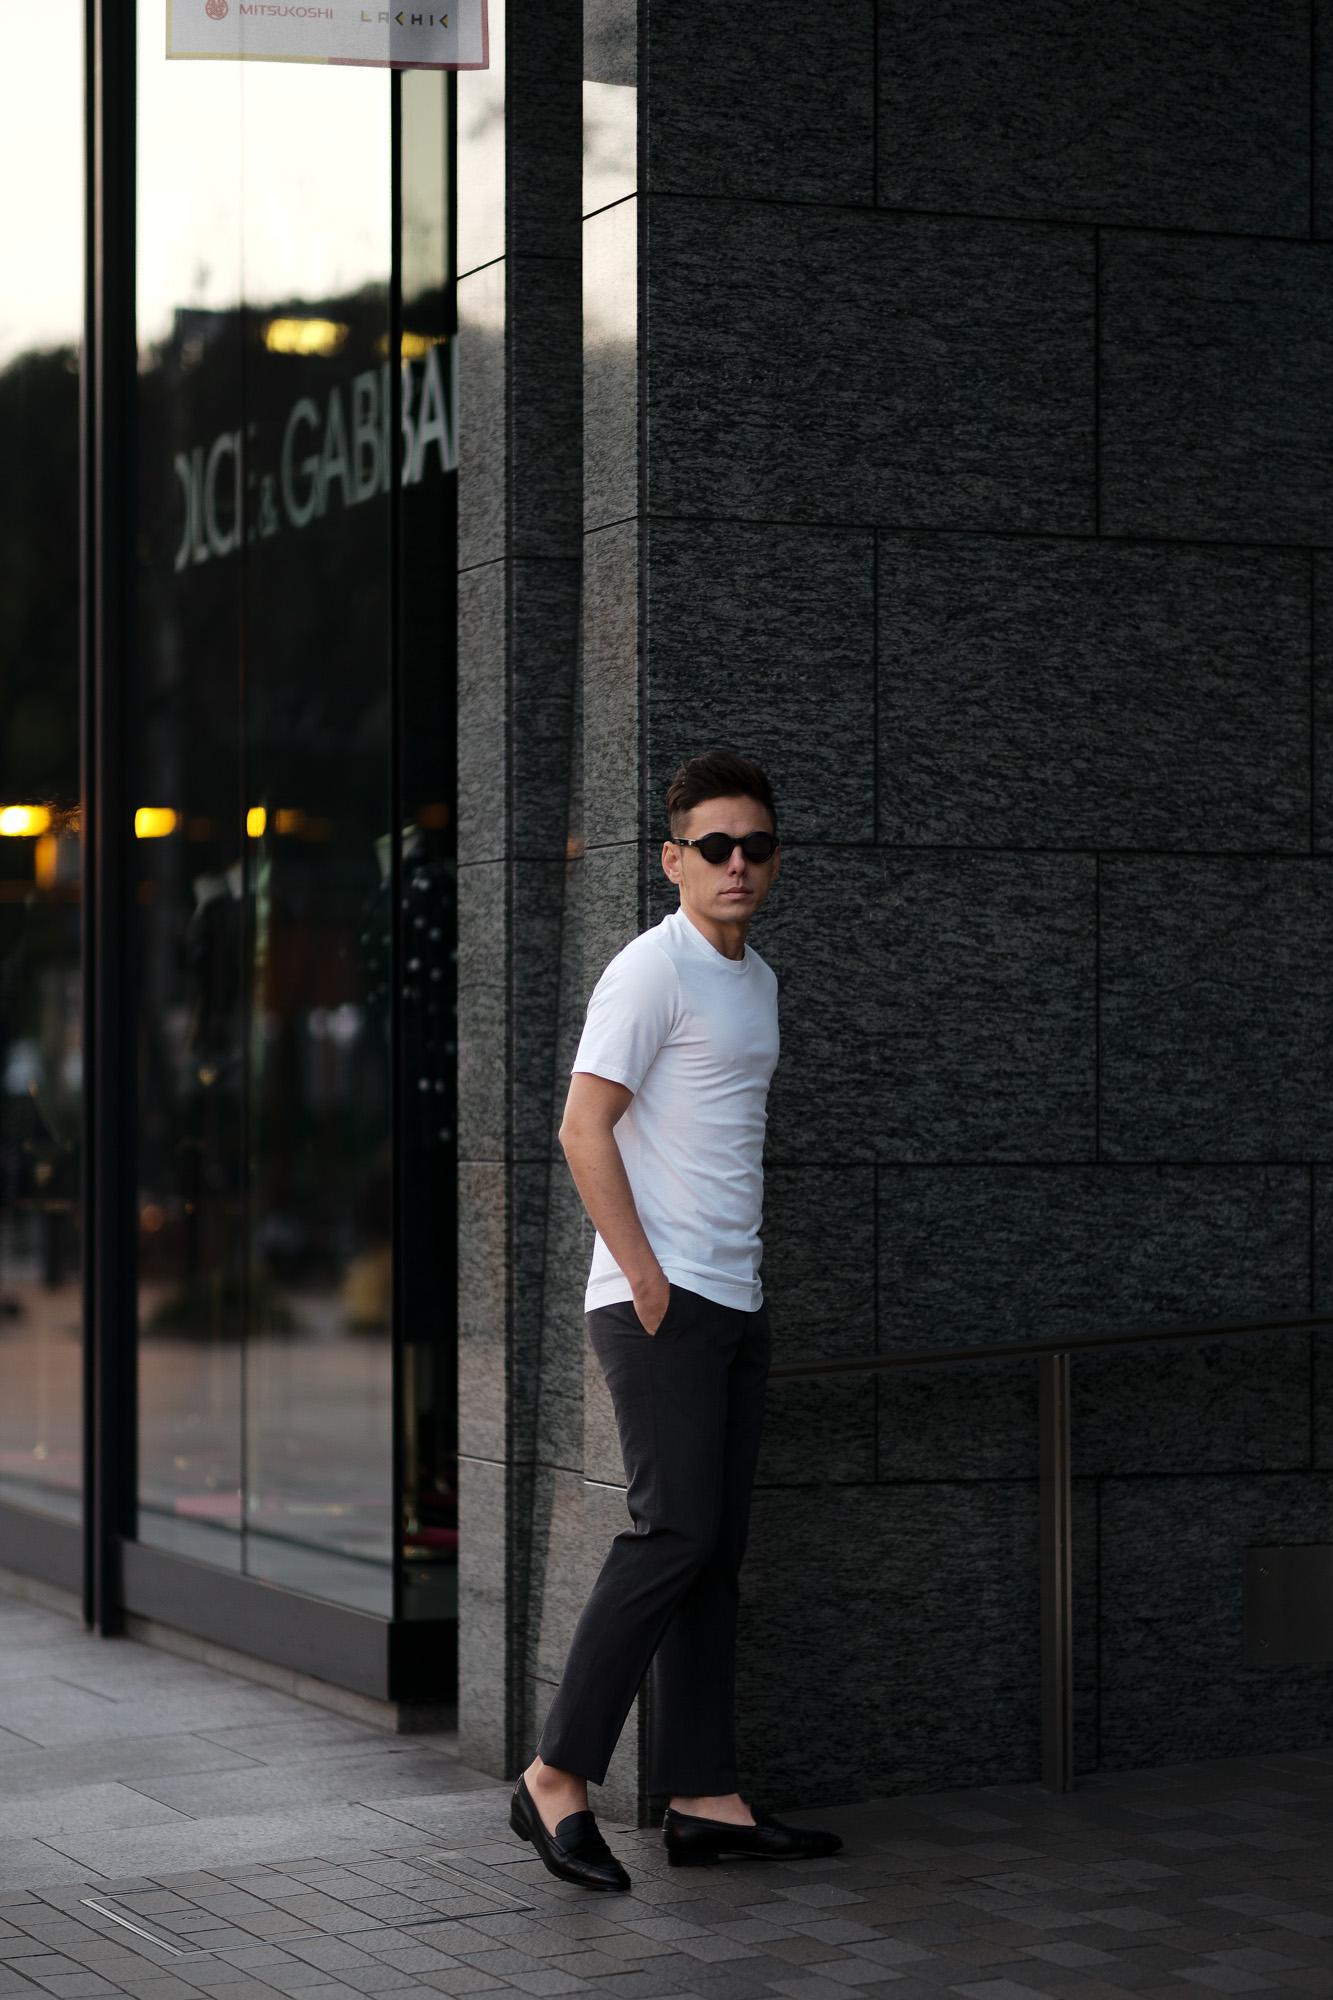 FEDELI(フェデーリ) Crew Neck T-shirt (クルーネック Tシャツ) ギザコットン Tシャツ WHITE (ホワイト・41) made in italy (イタリア製) 2020 春夏新作 愛知 名古屋 altoediritto アルトエデリット TEE